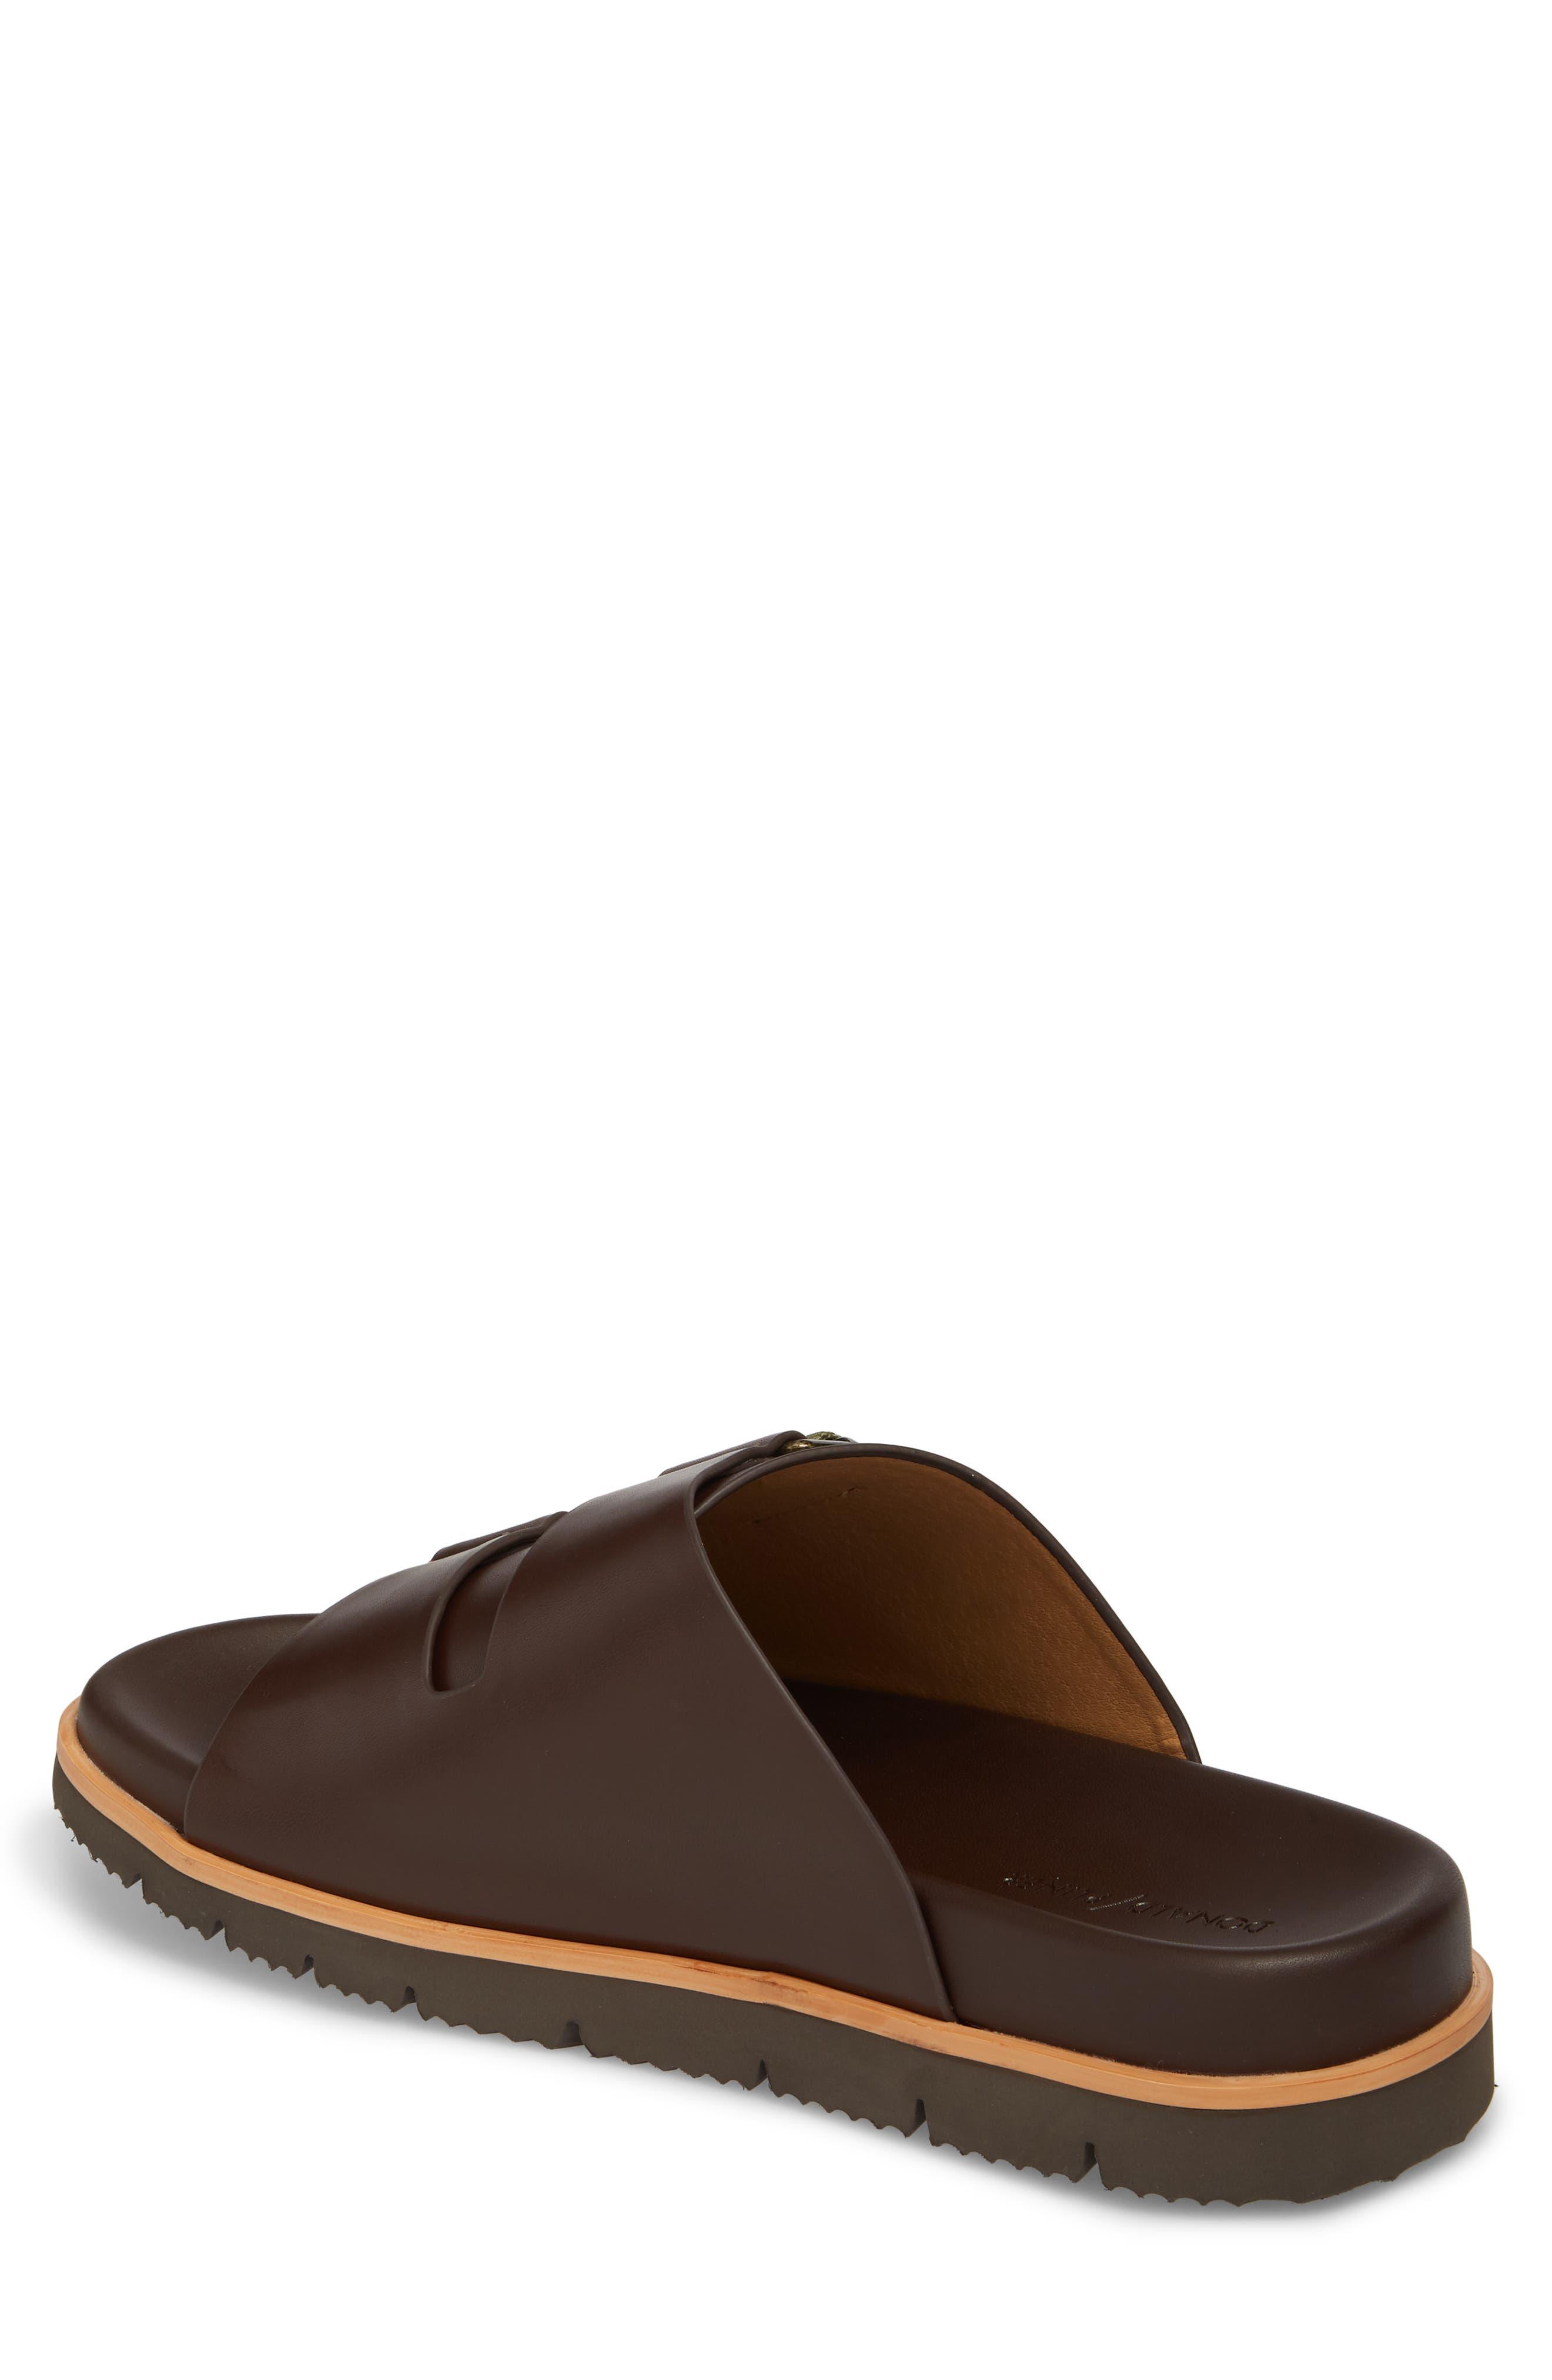 Slide Sandal,                             Alternate thumbnail 2, color,                             Expresso/ Tan Leather